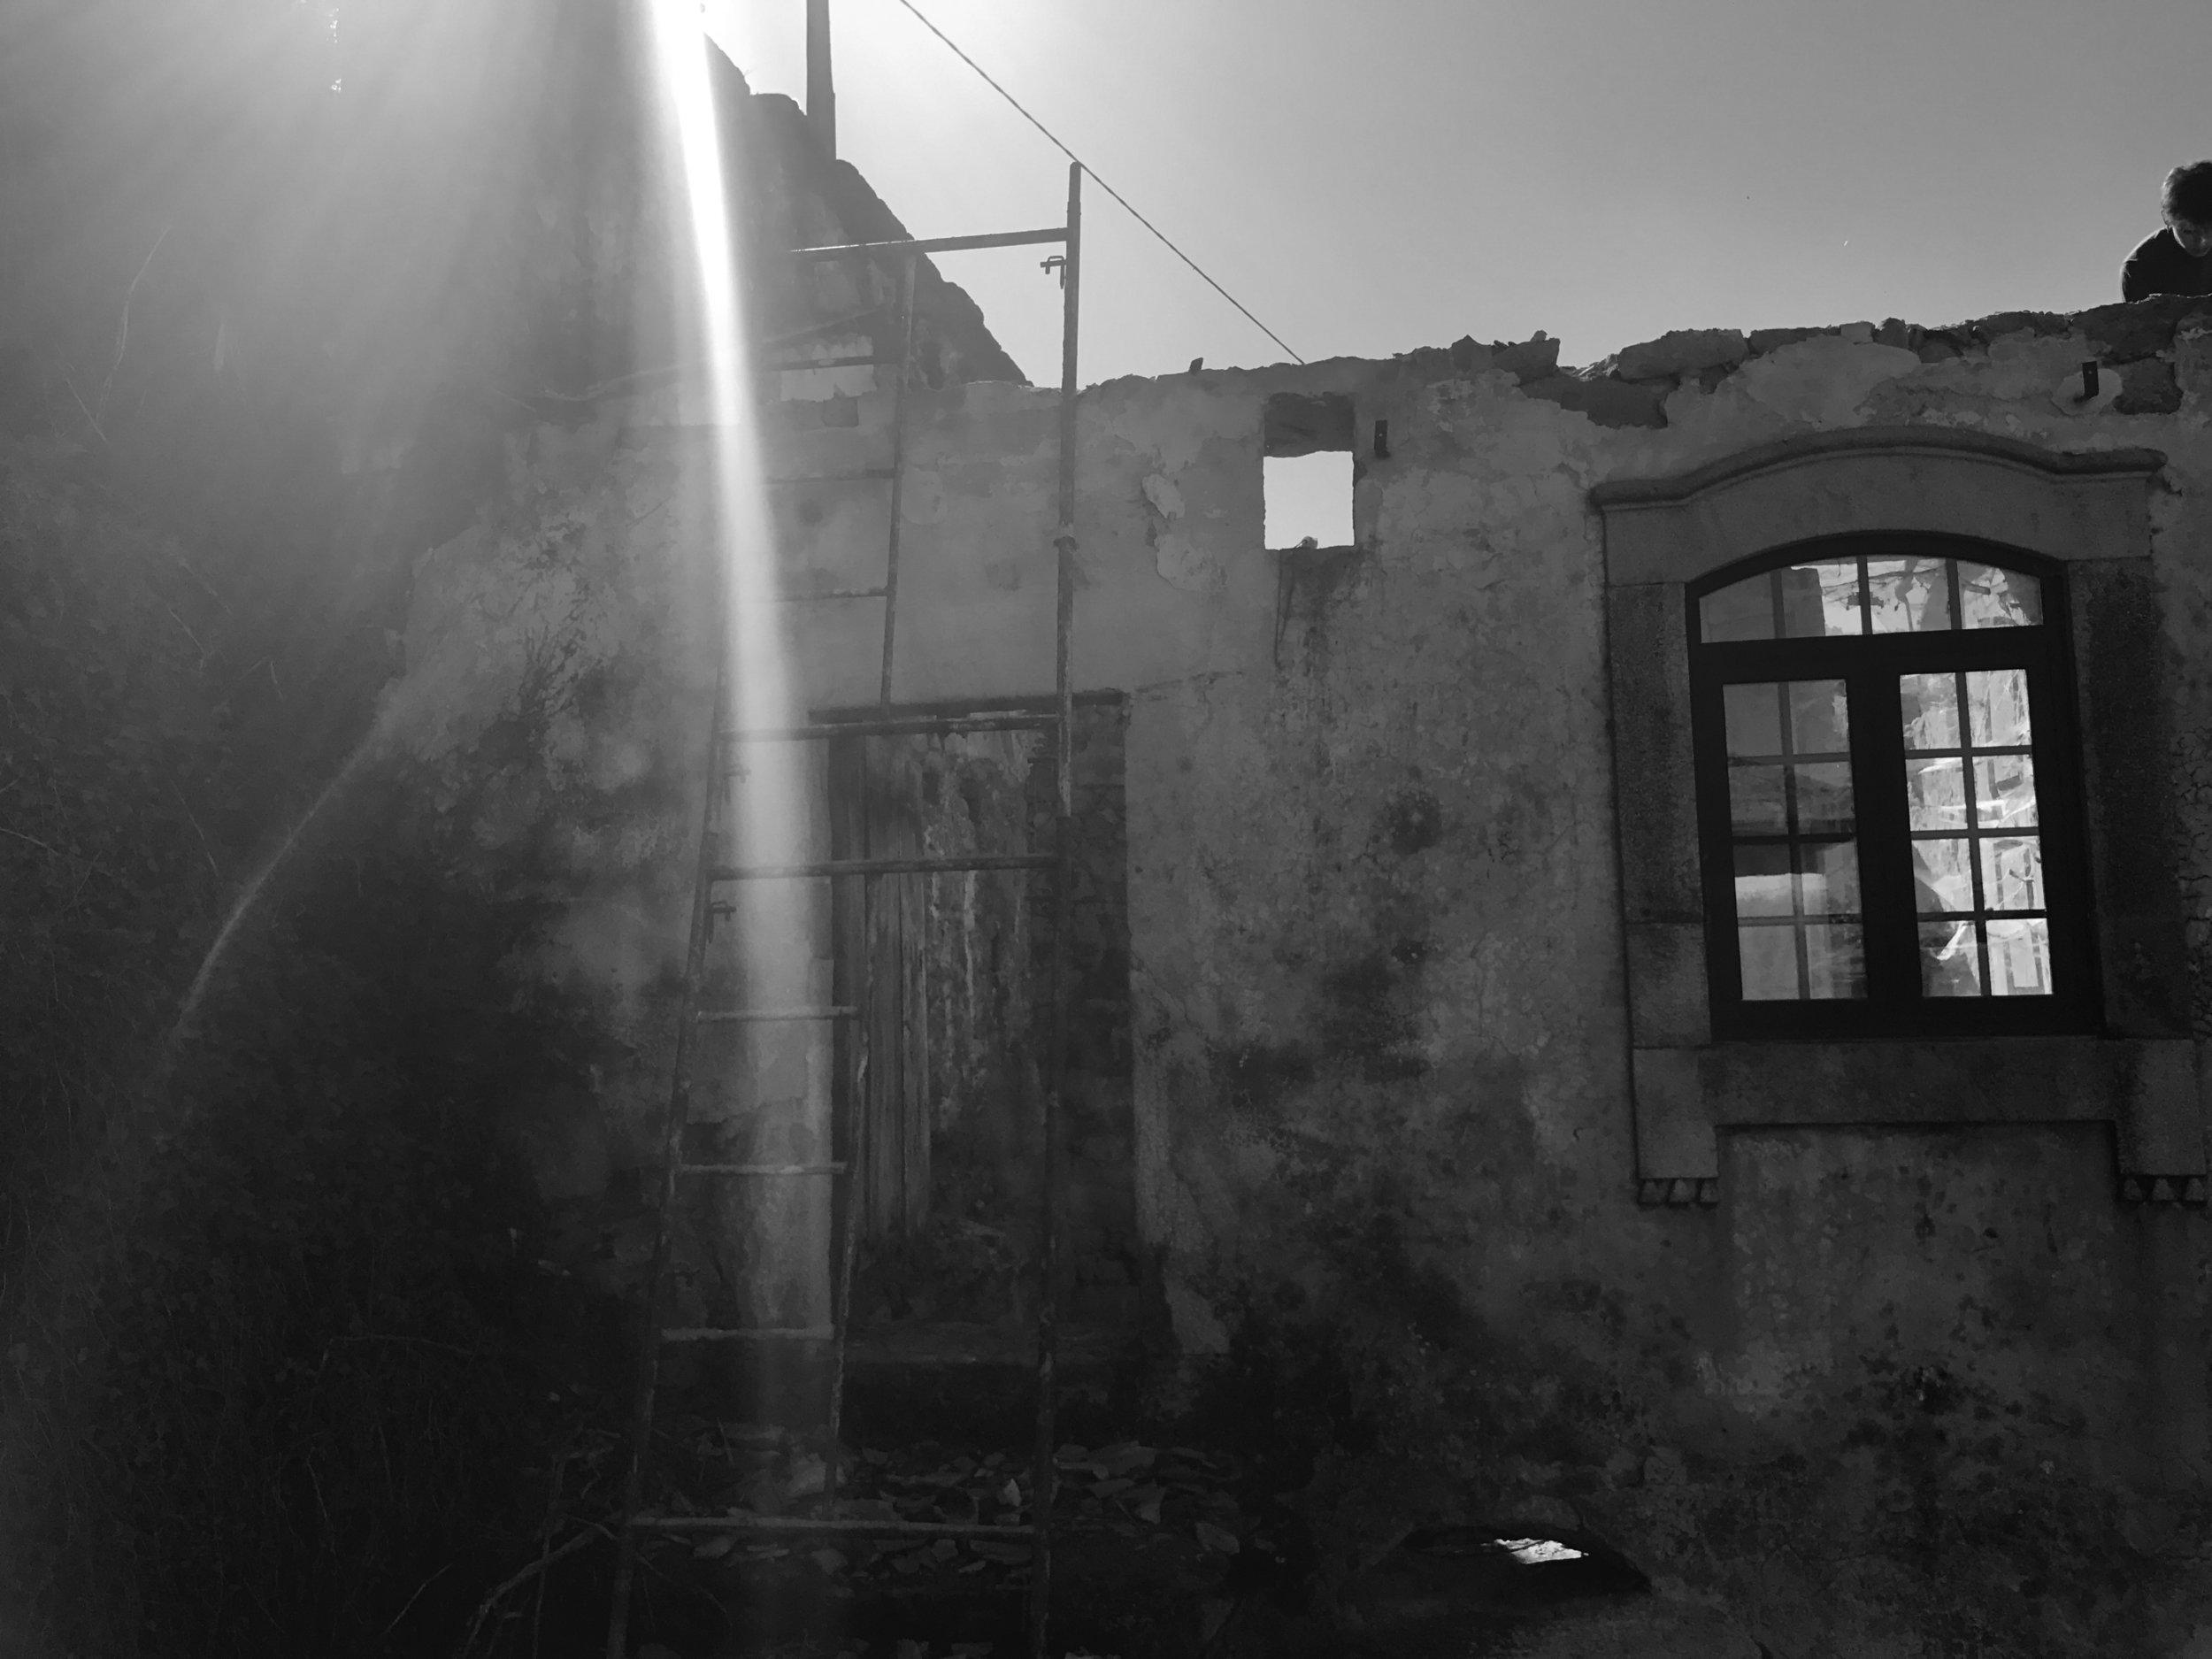 Moradia Folgorosa - Vale de Cambra - EVA atelier - Arquitectura - Obra (5).jpg